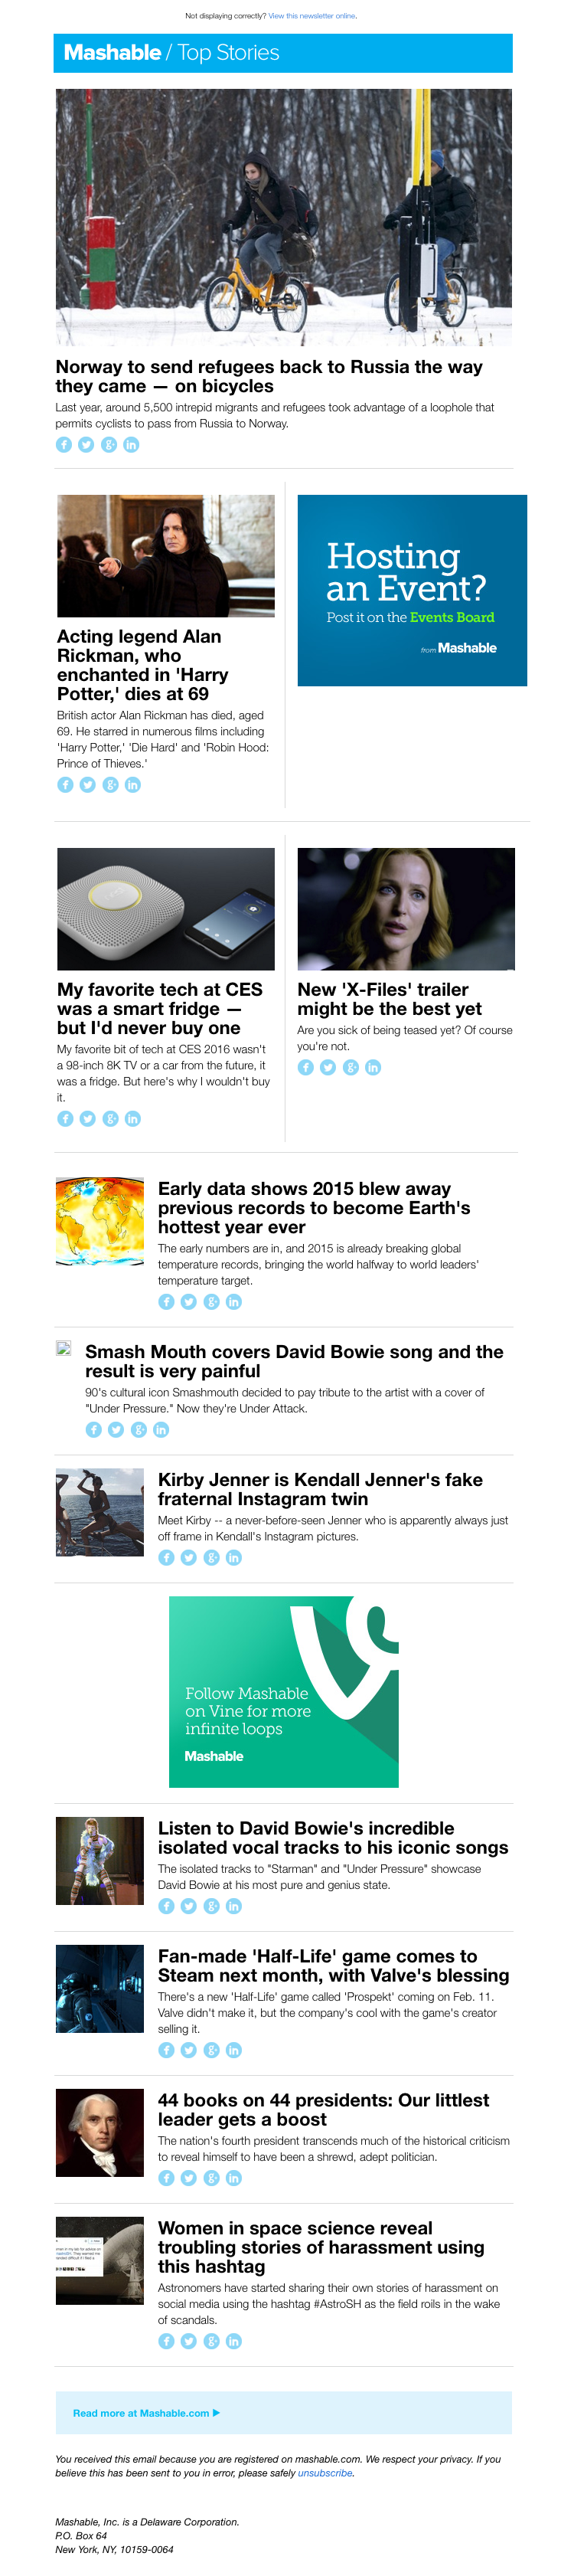 mashable-newsletter